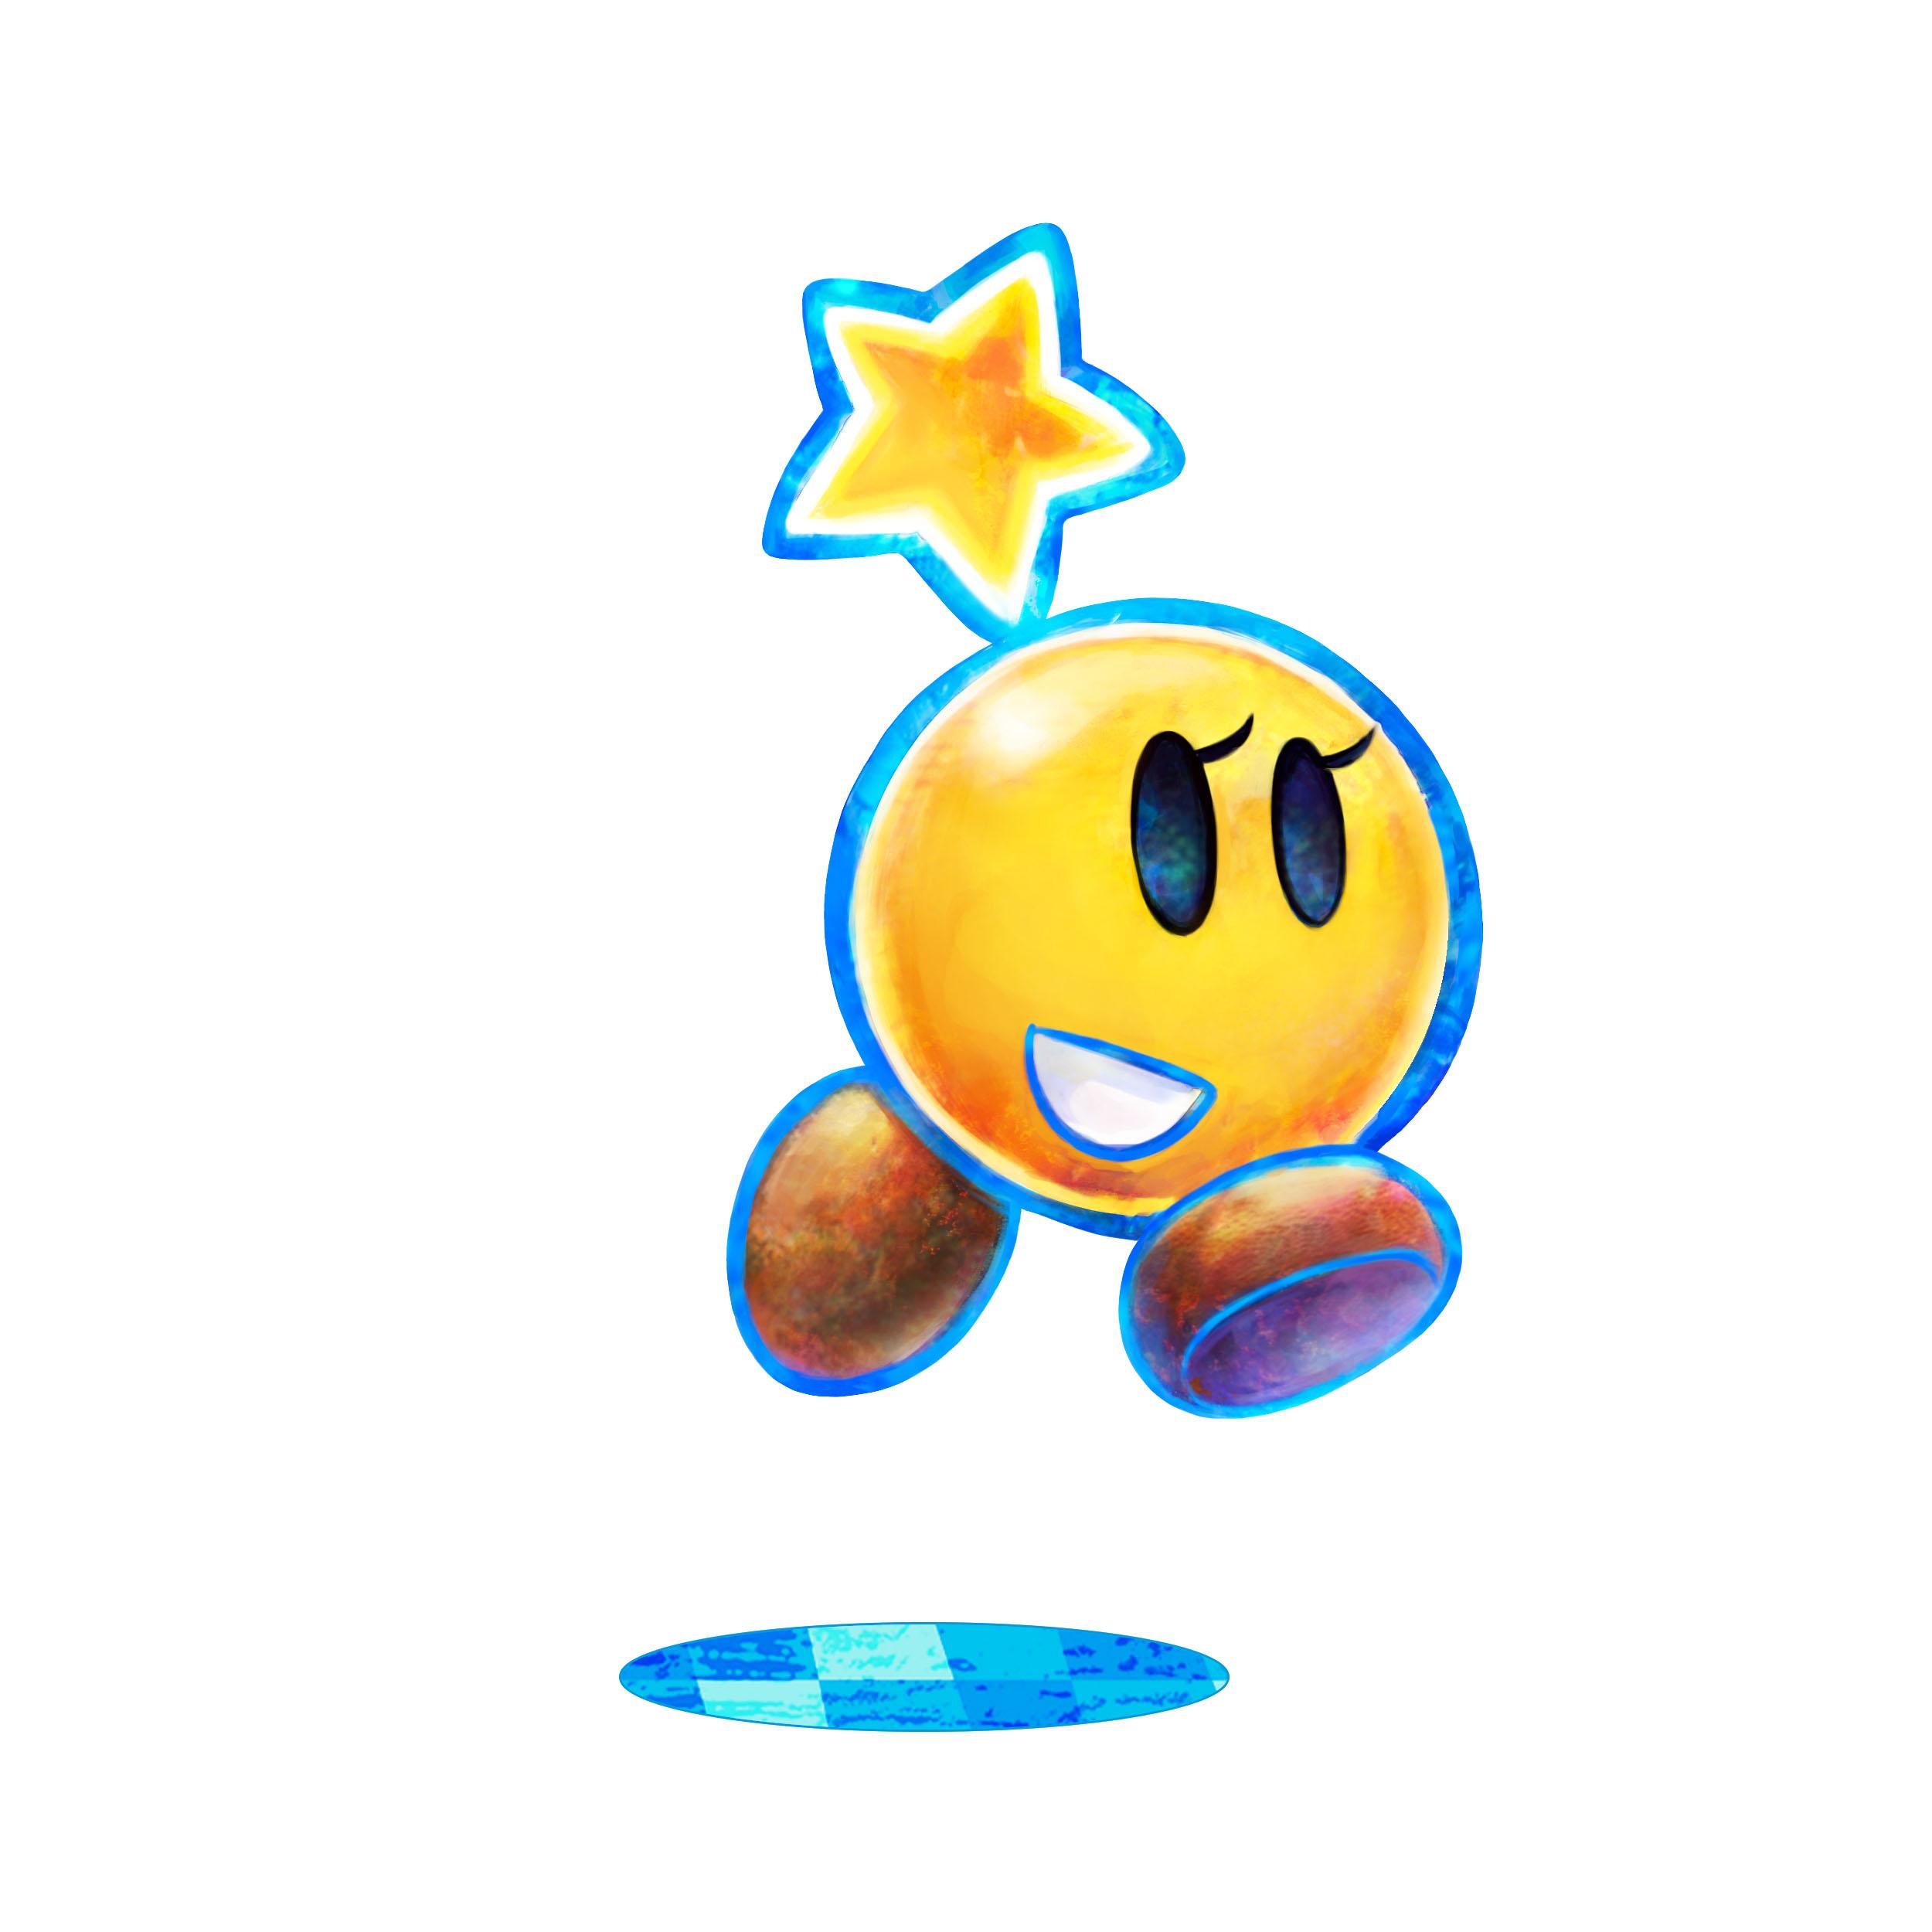 Mario clipart smiling star Official Luigi: Luigi: Set &